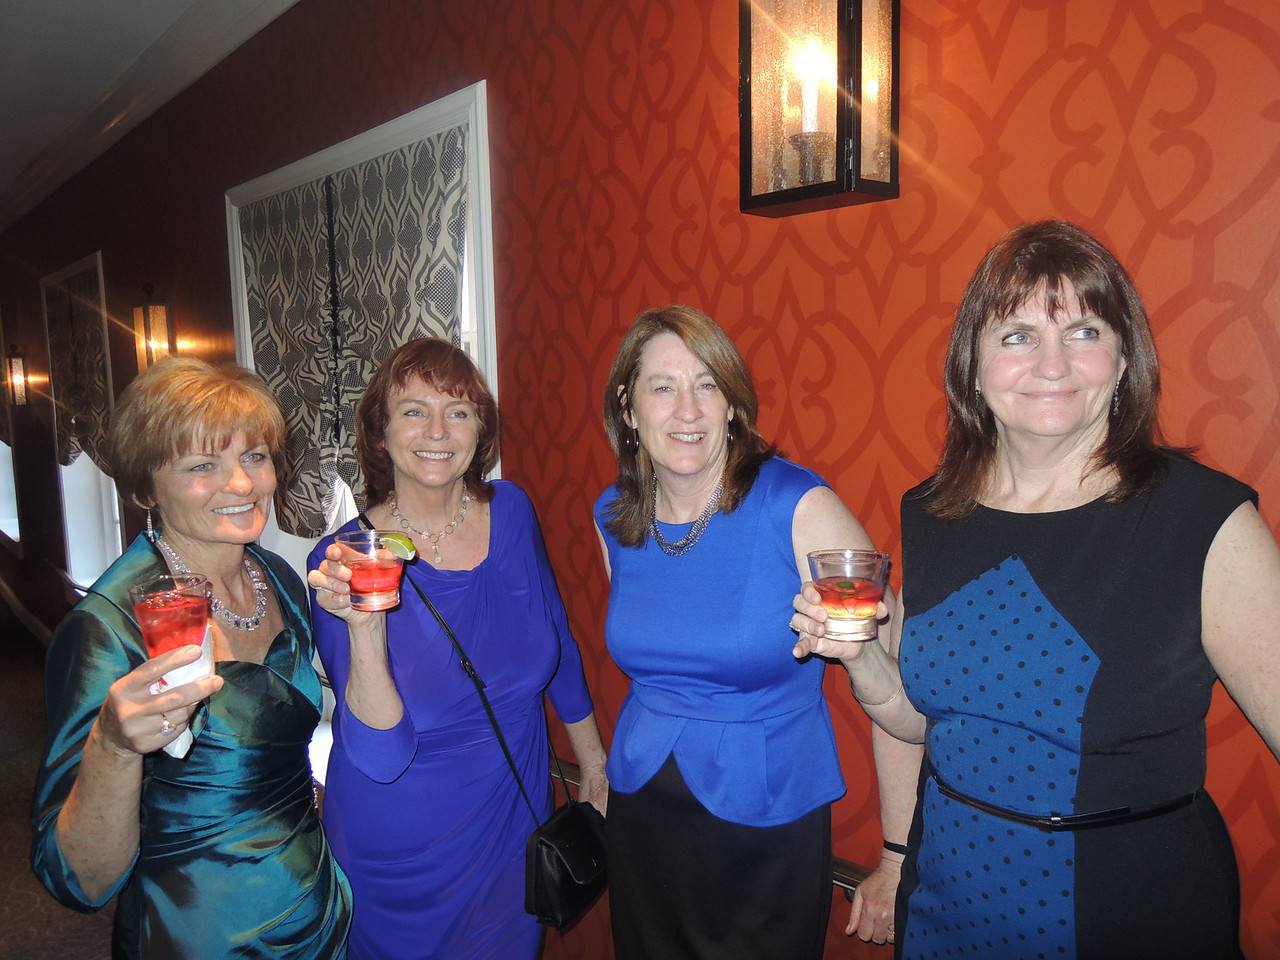 The Warren Girls party again.